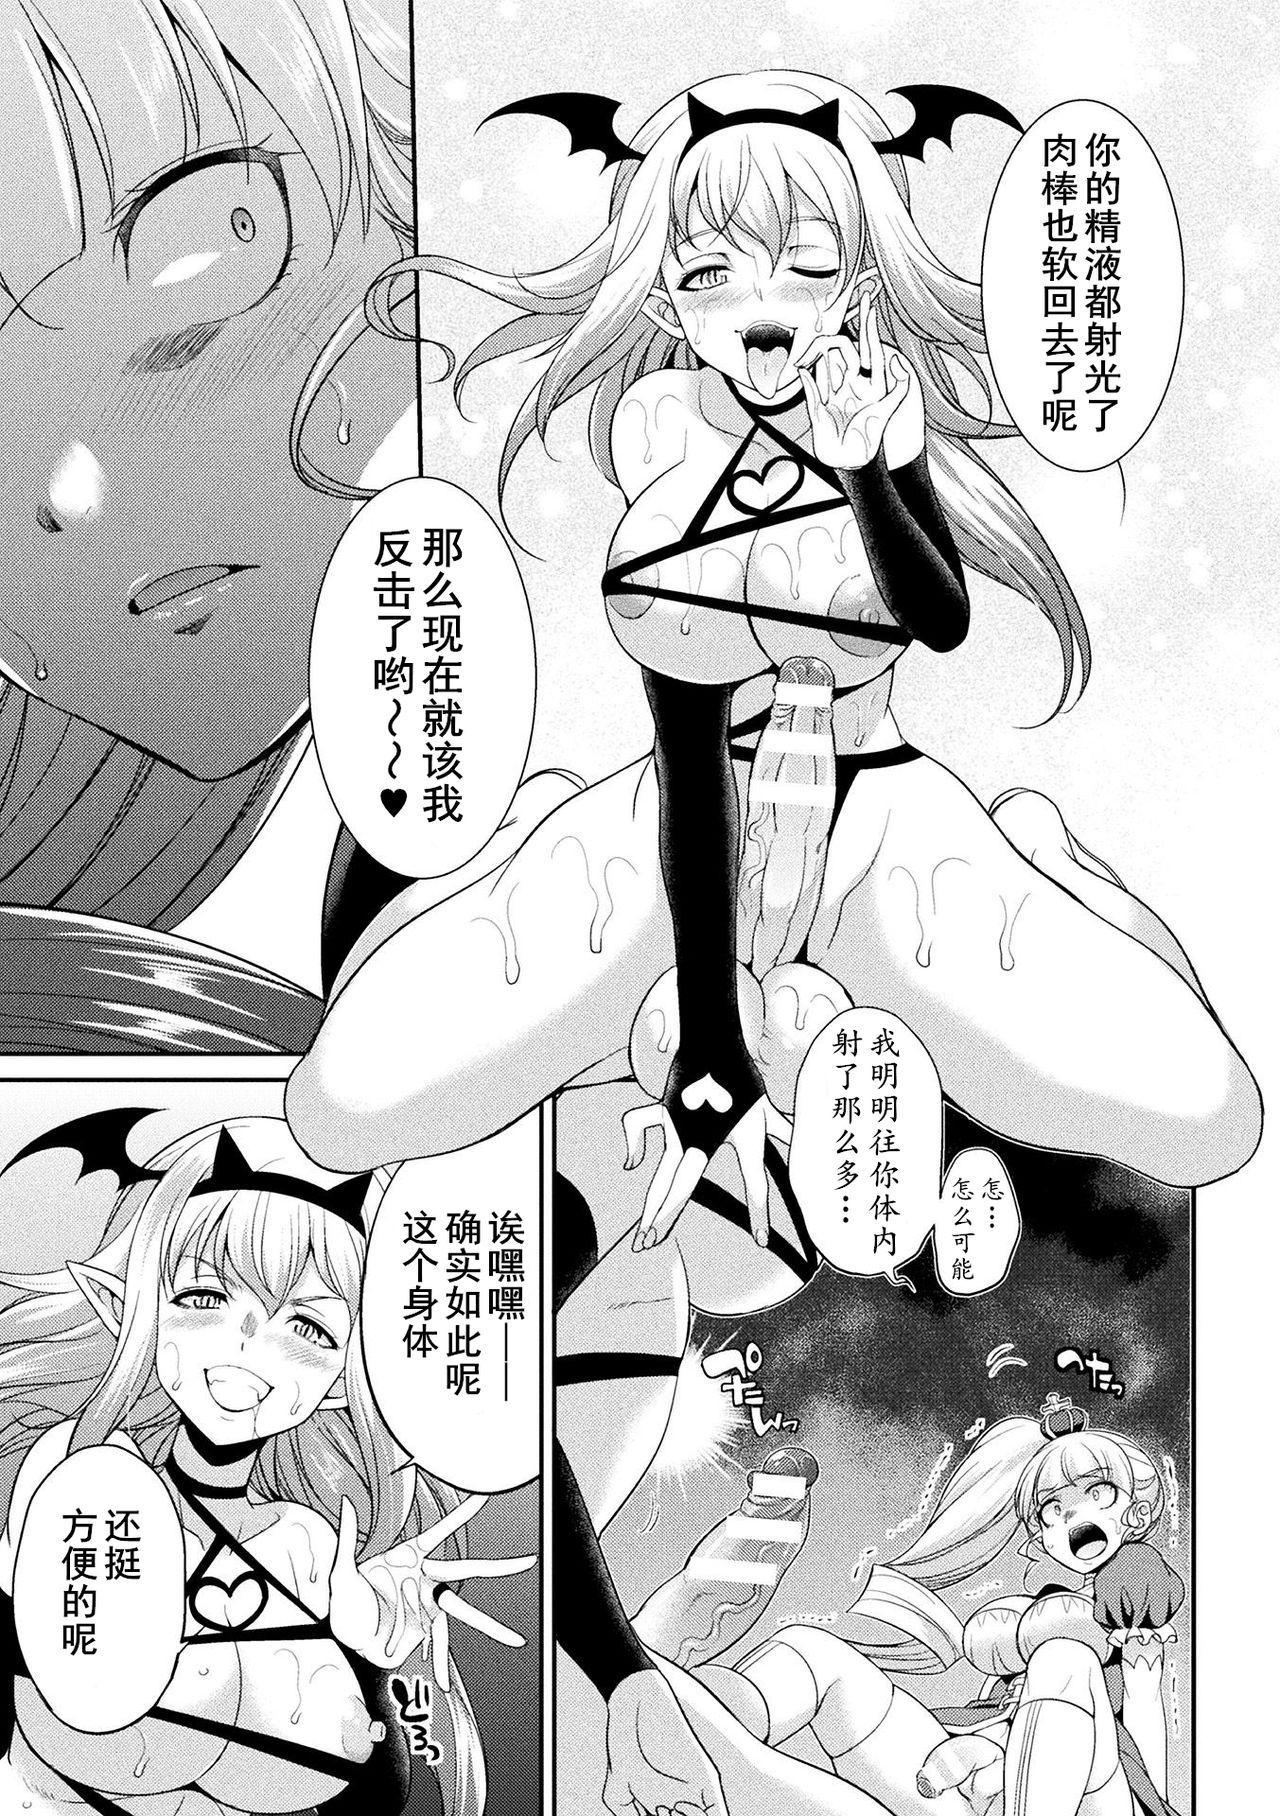 [Kaguya] Futanarijima ~The Queen of Penis~ Ch. 4 [Chinese] [黄记汉化组] 15